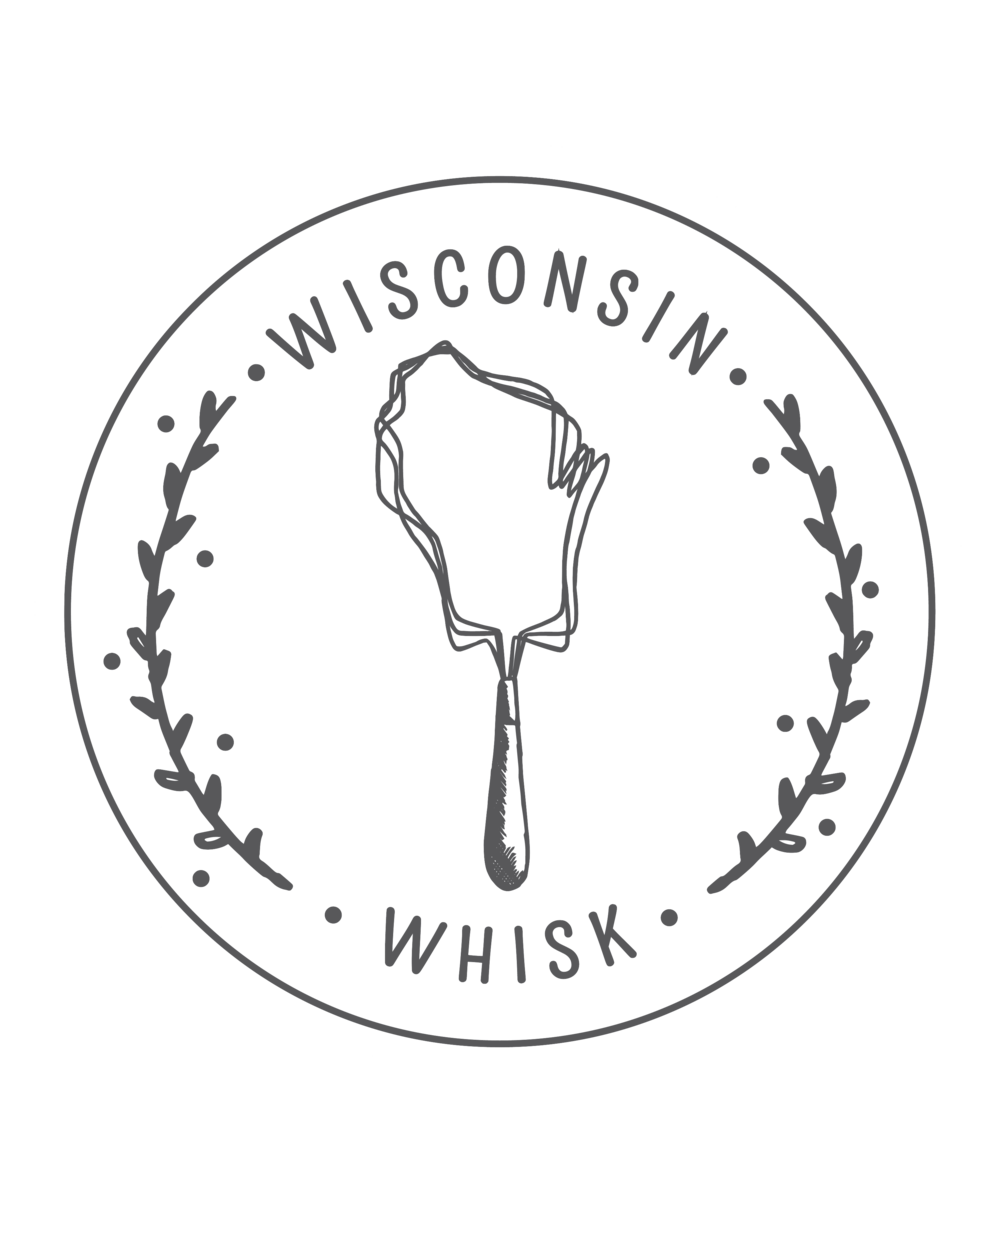 Whisk Badge.png